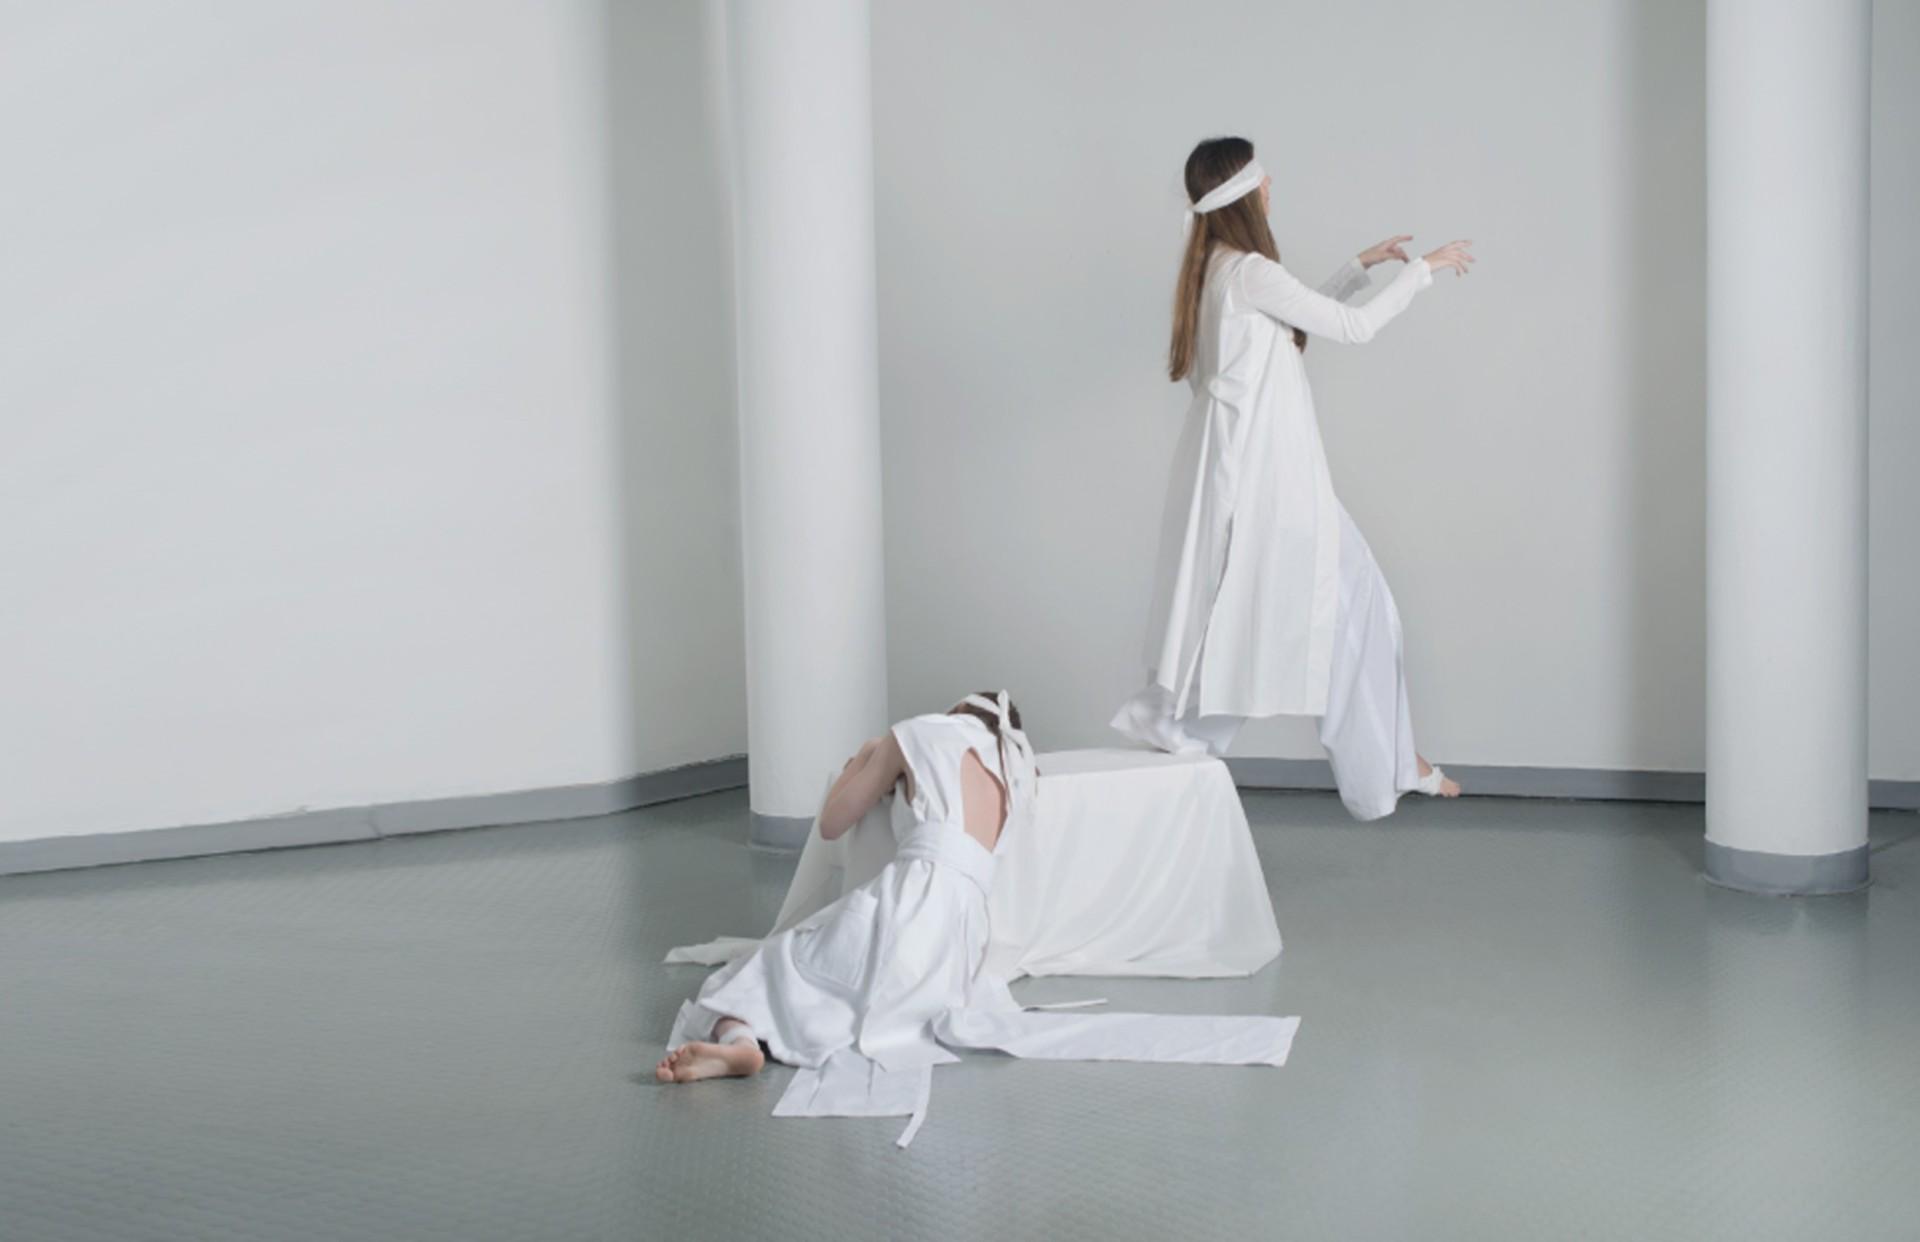 The Sleepwalker, Yvonne Lin, designer, Courtesy of Yvonne Lin